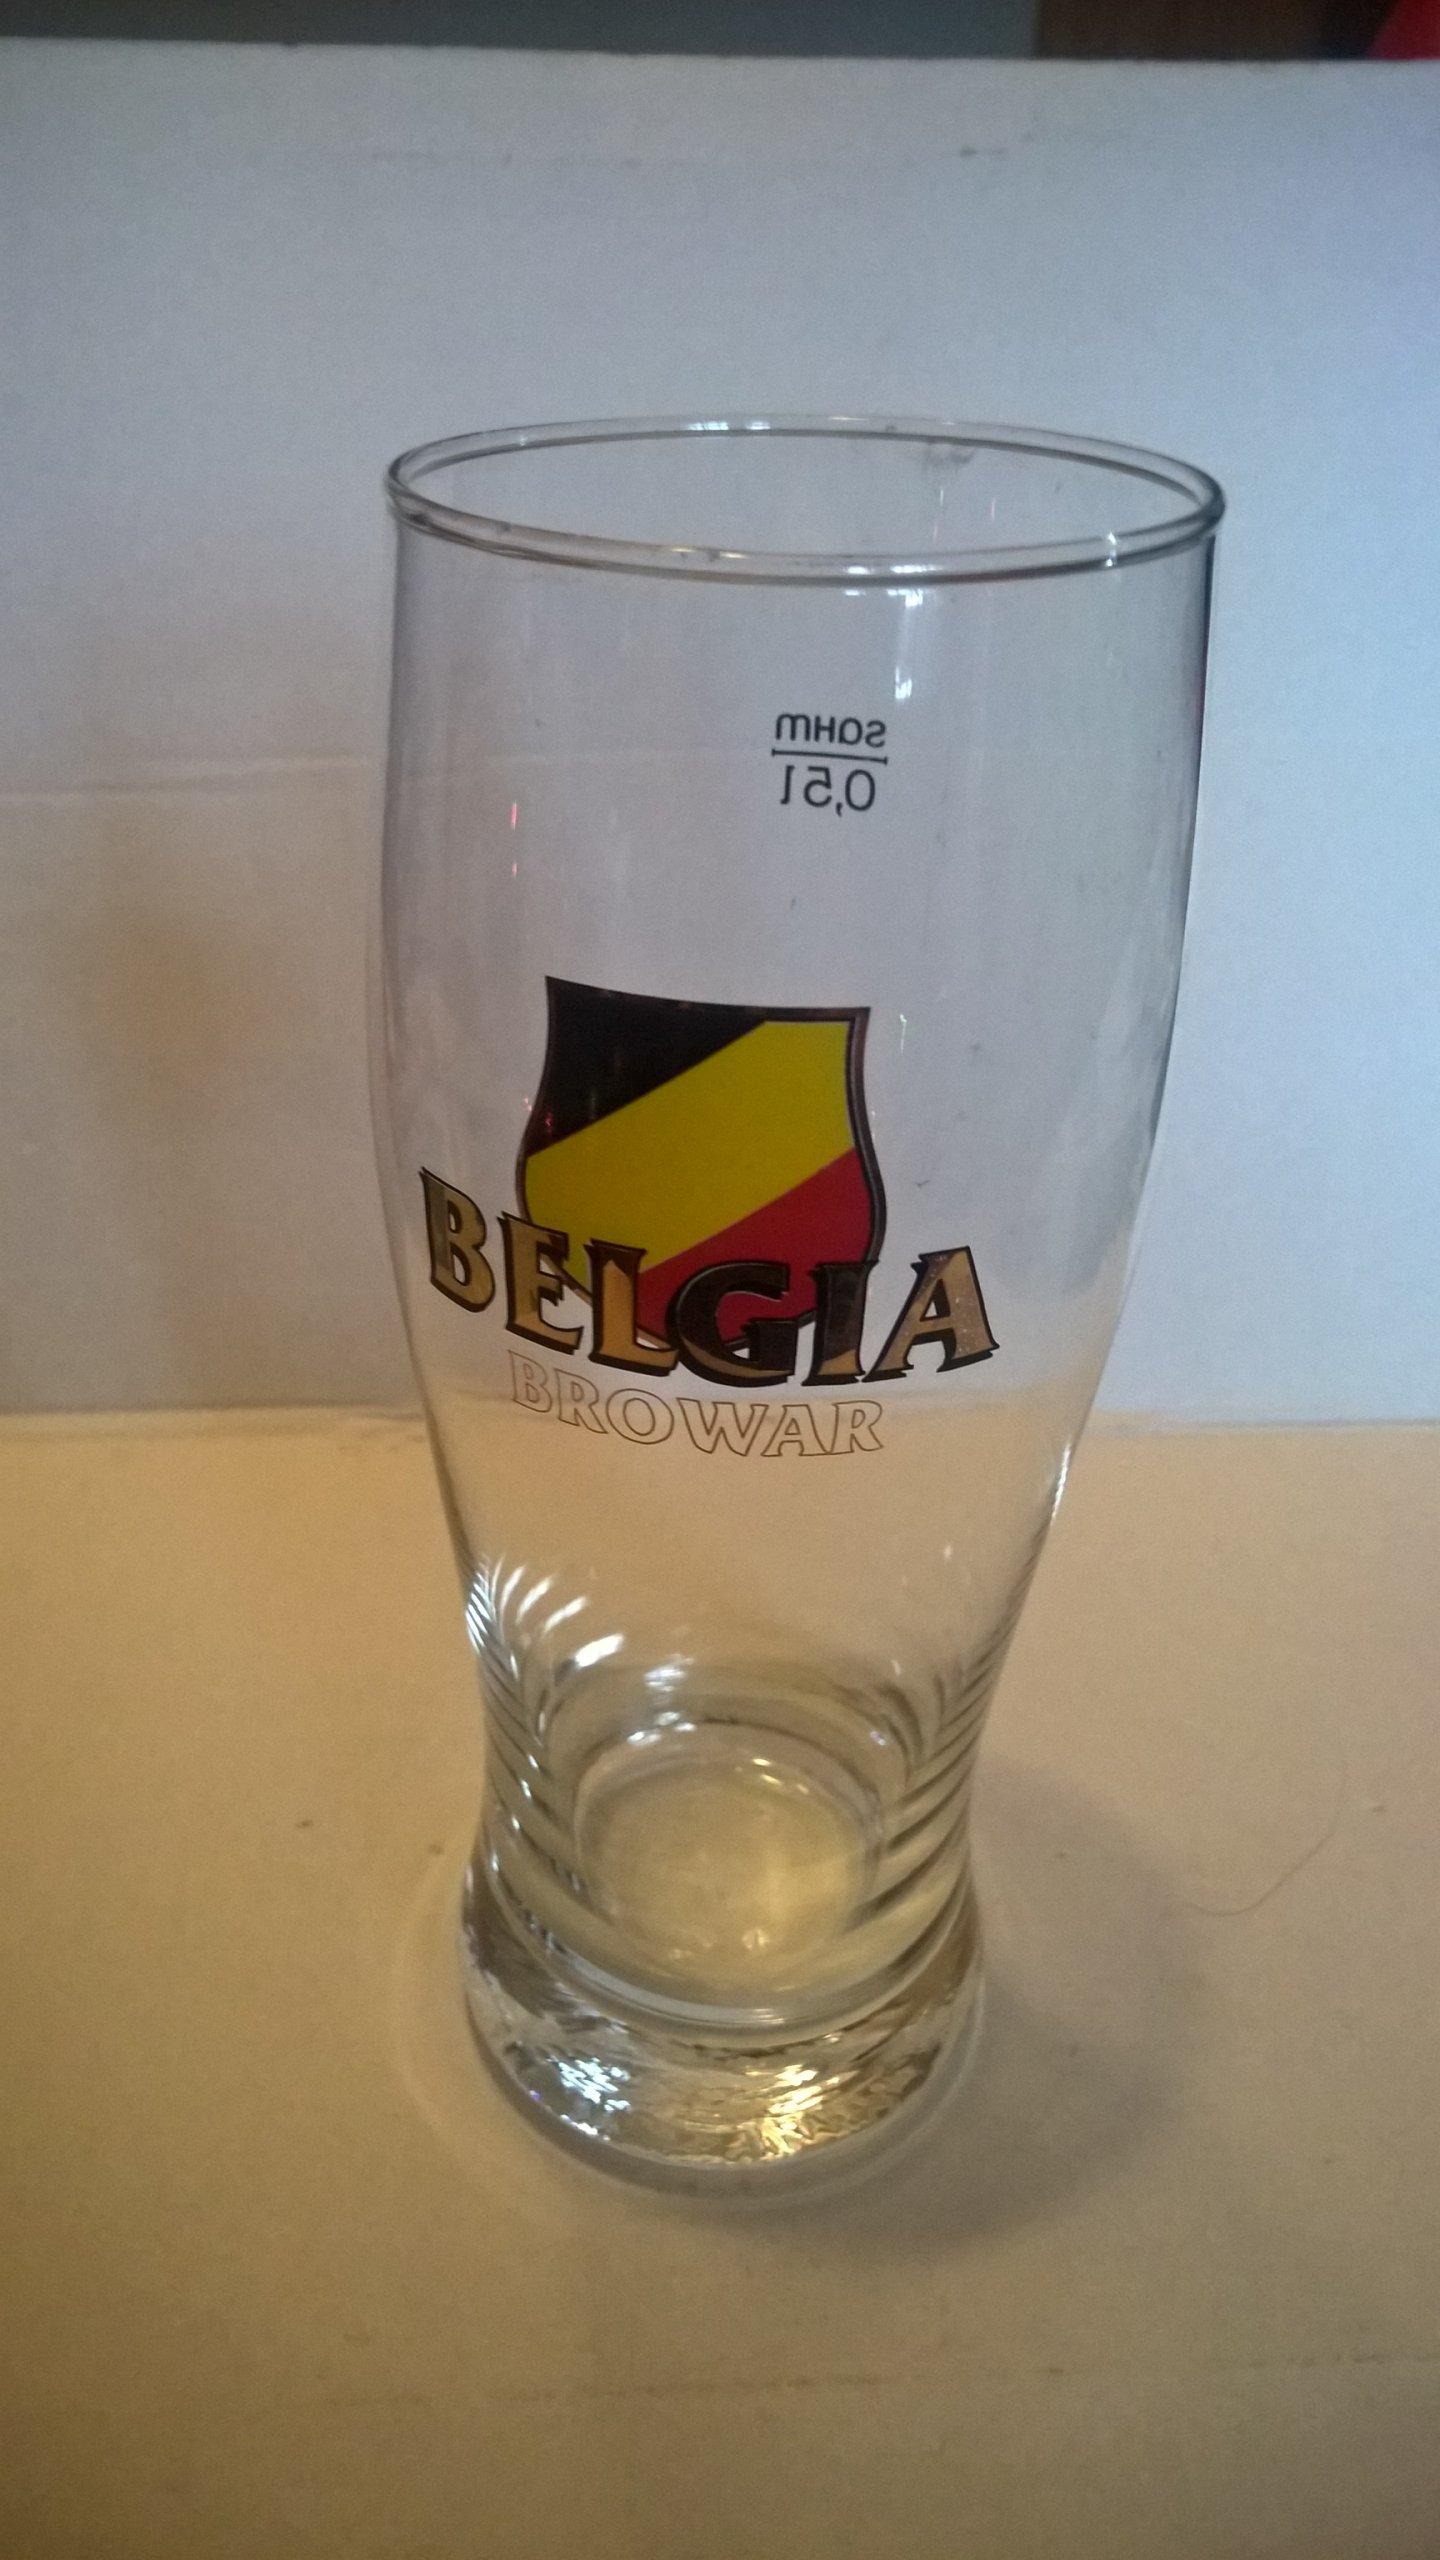 Browar Belgia, Kielce poj.0,5L